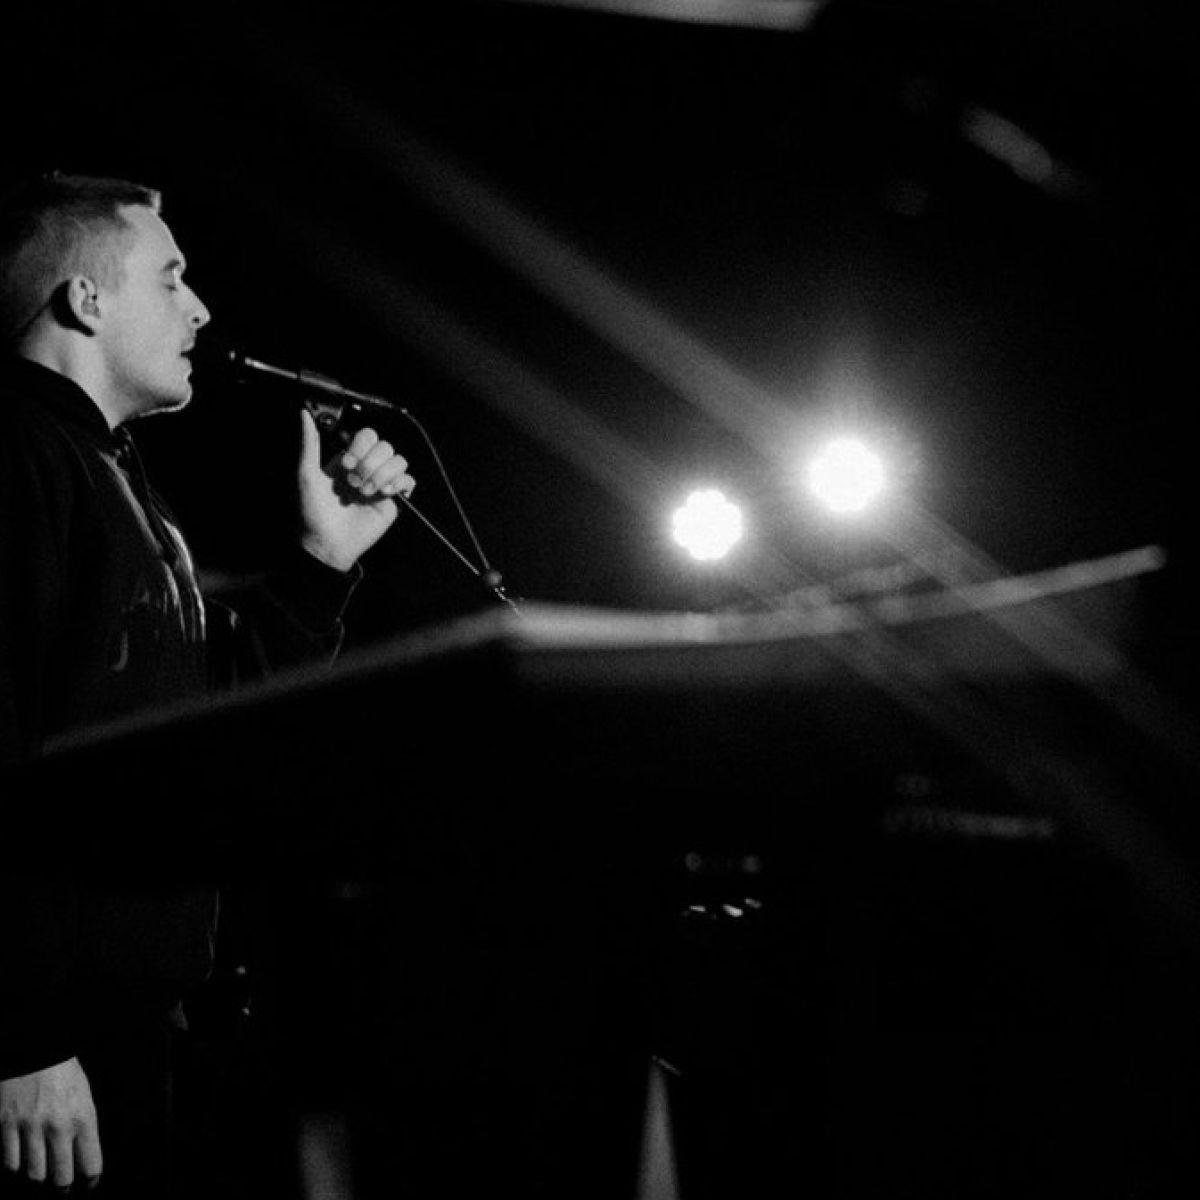 Allison Parker Snap Chat Videos irish musician dermot kennedy a standout act at major us